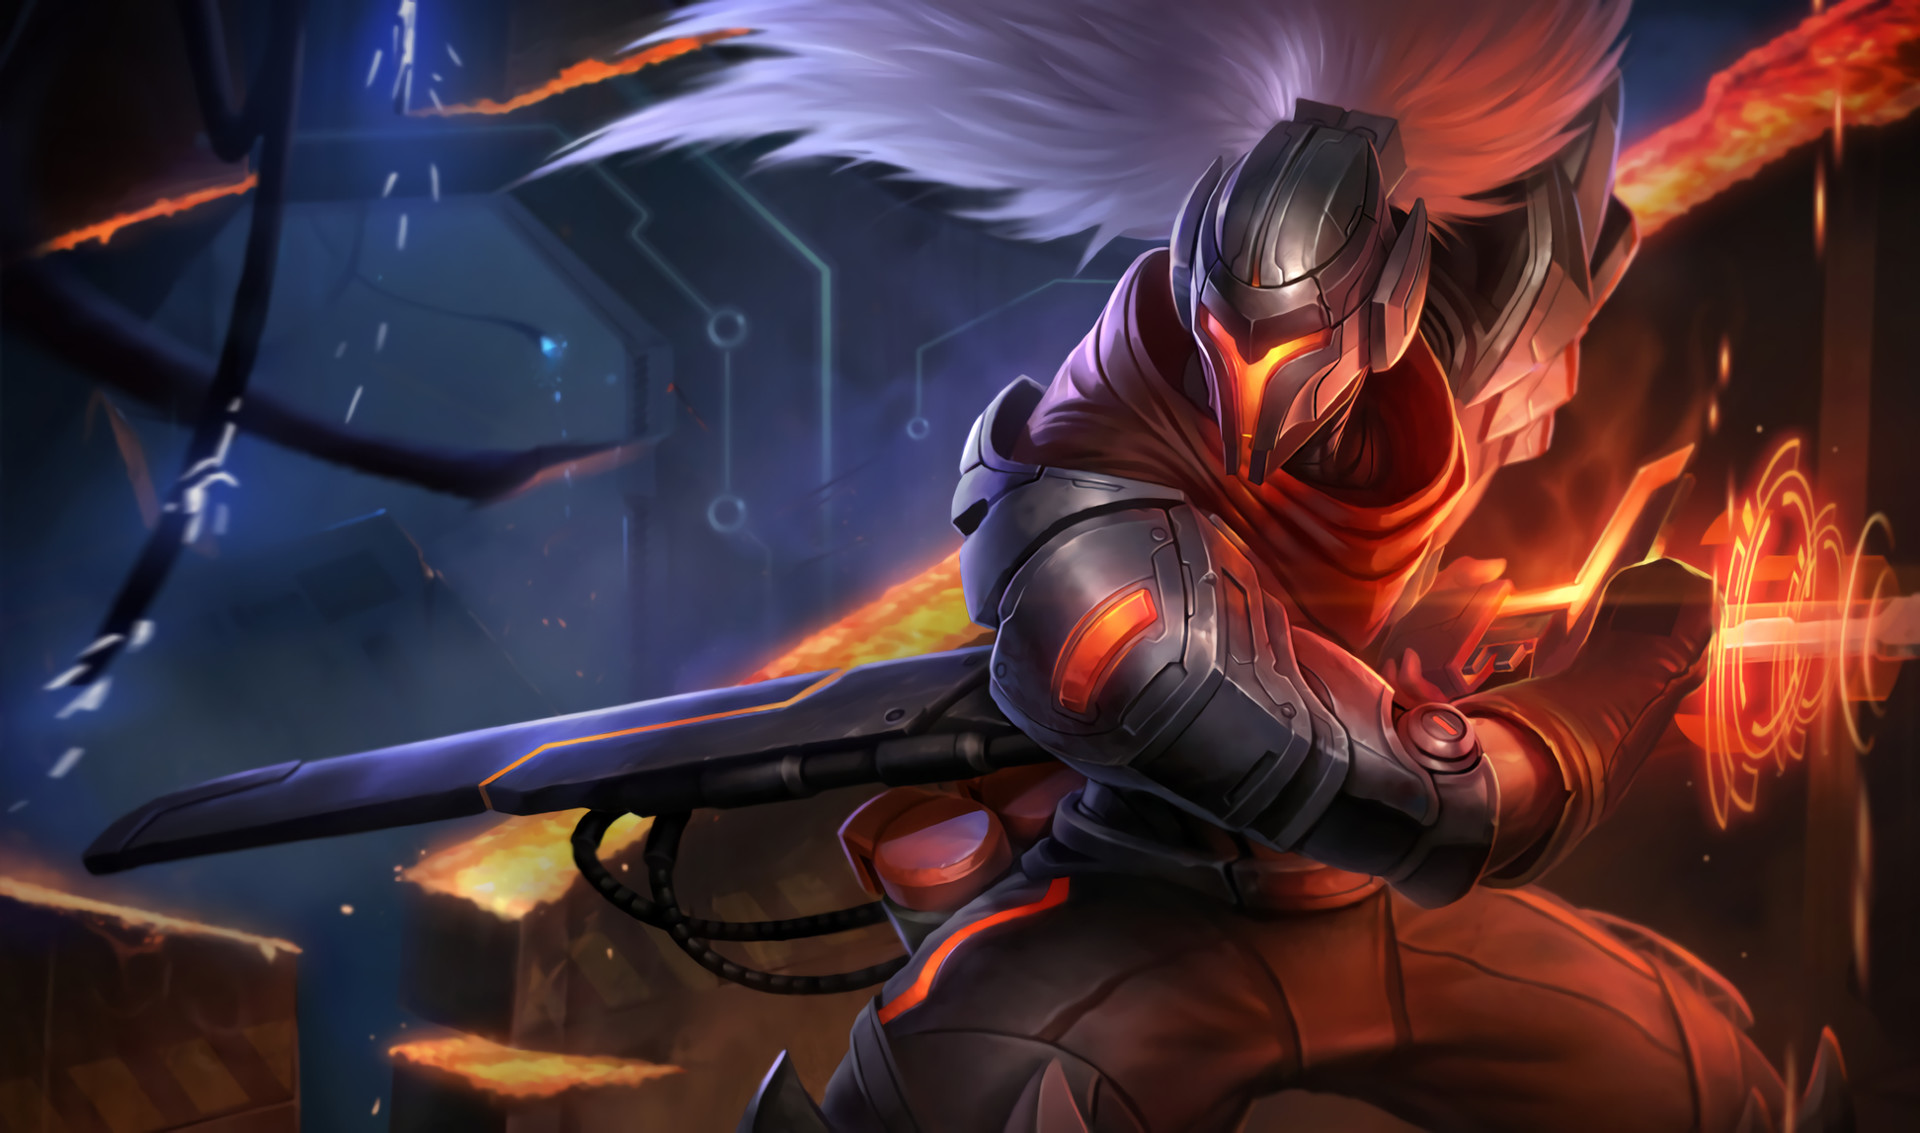 Video Game – League Of Legends Yasuo (League Of Legends) Sword Wallpaper